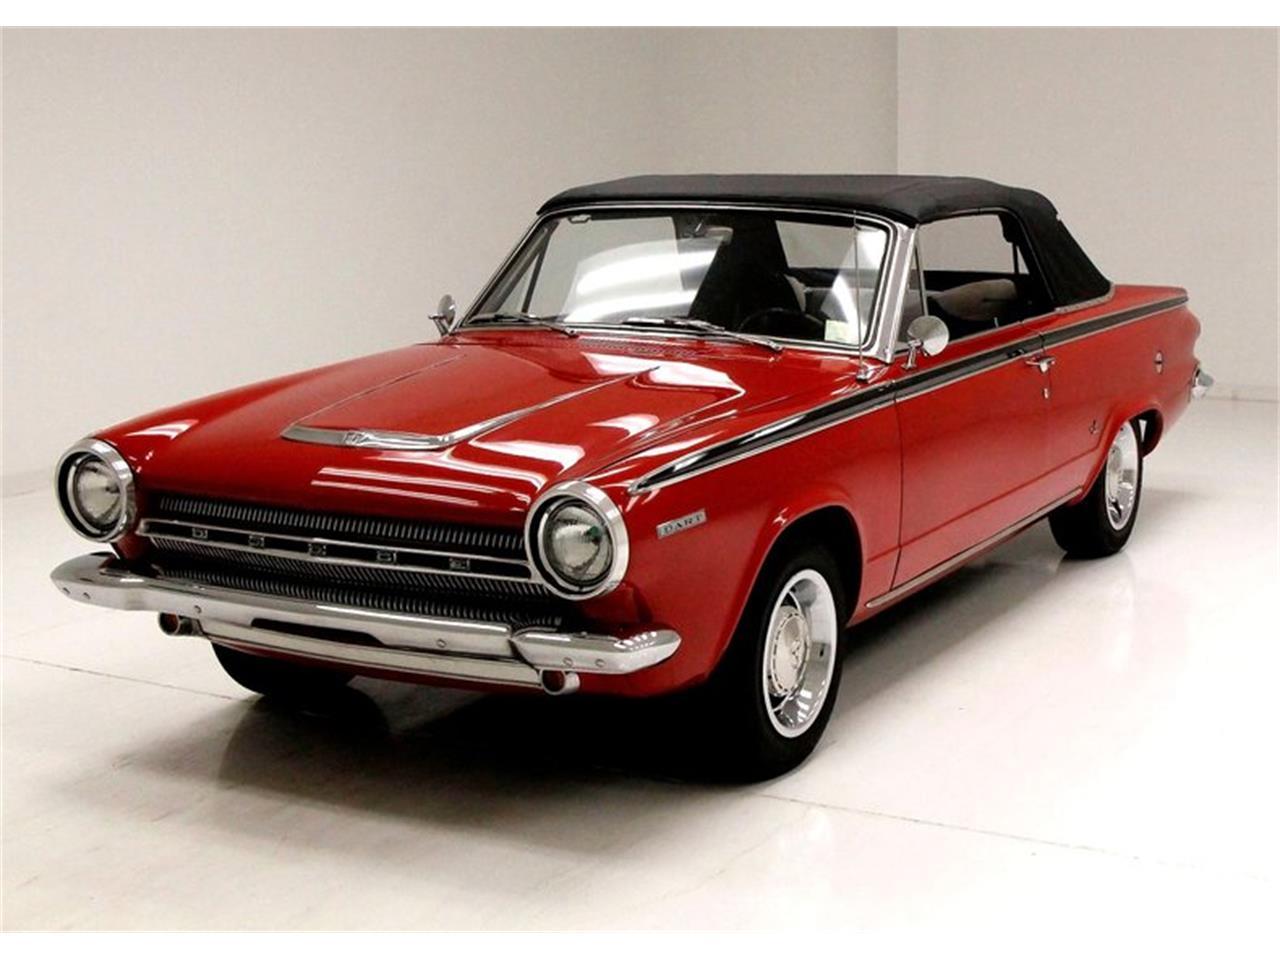 Dodge Dart Prix tout compris 1964